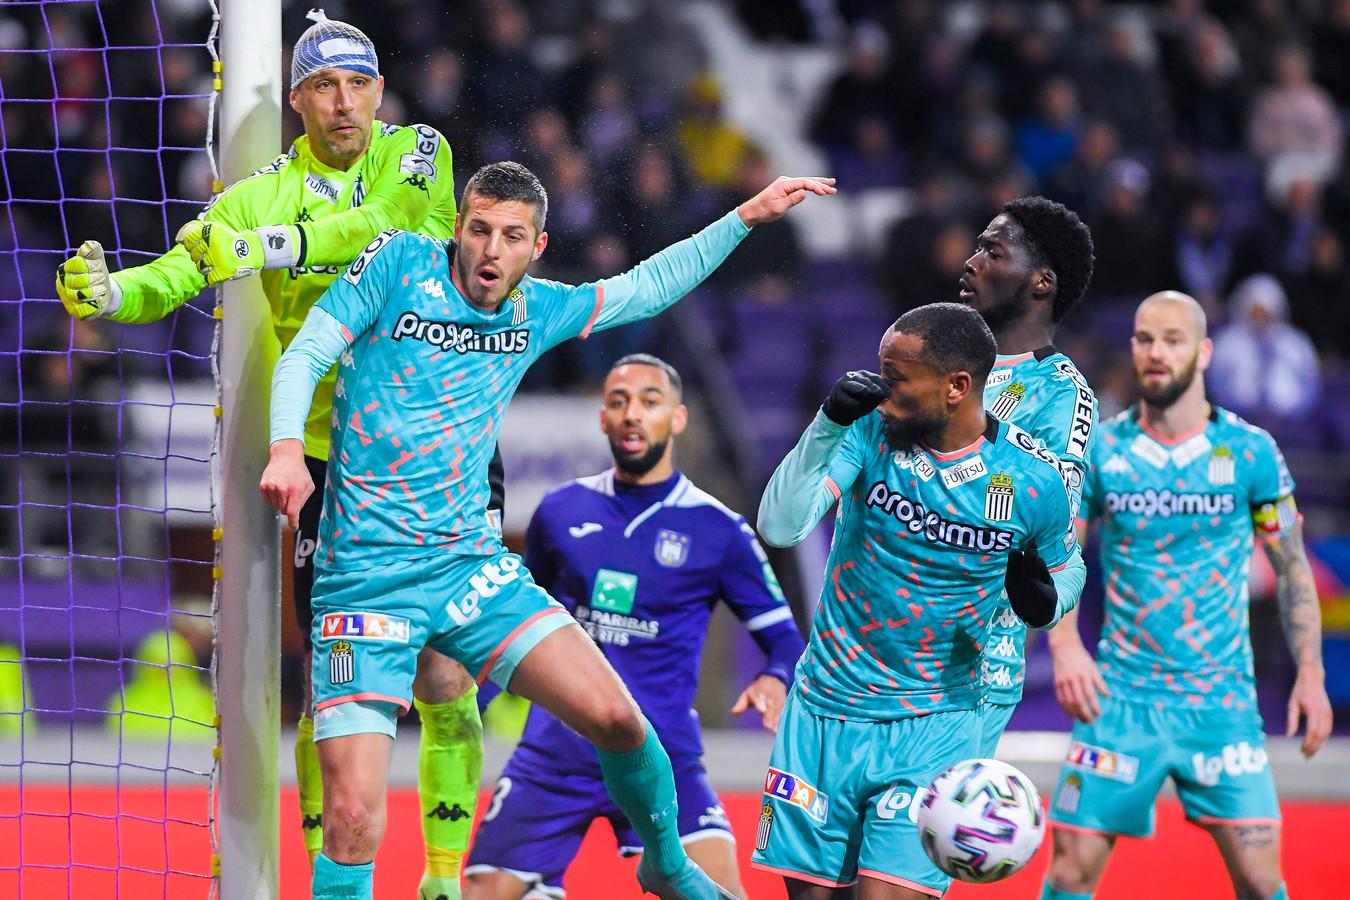 Charleroi-keeper Penneteau speelt met een netje vanwege een hoofdblessure.